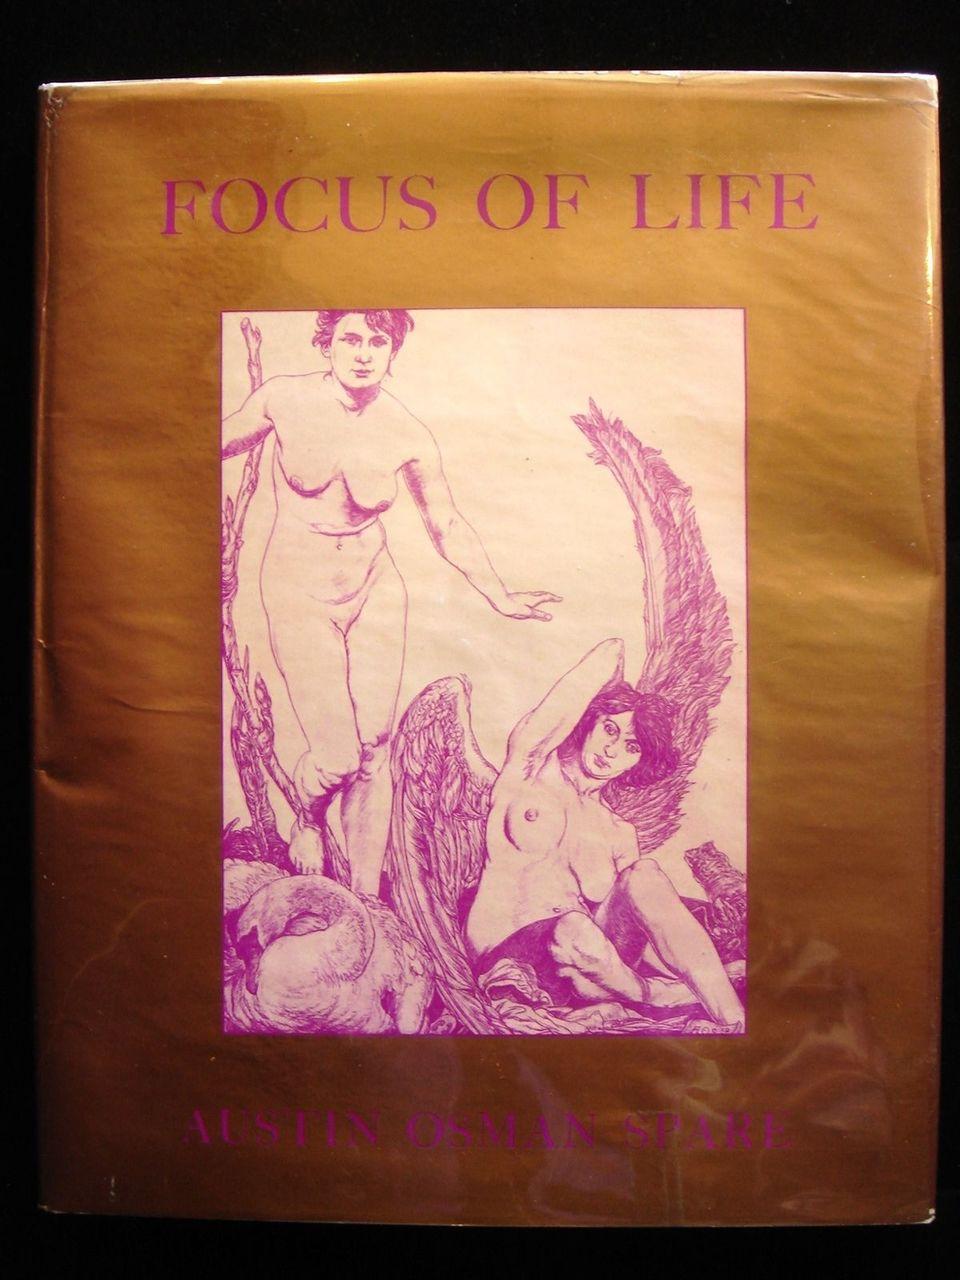 FOCUS ON LIFE, by Austin Osman Spare - 1975 [Limited Ed]